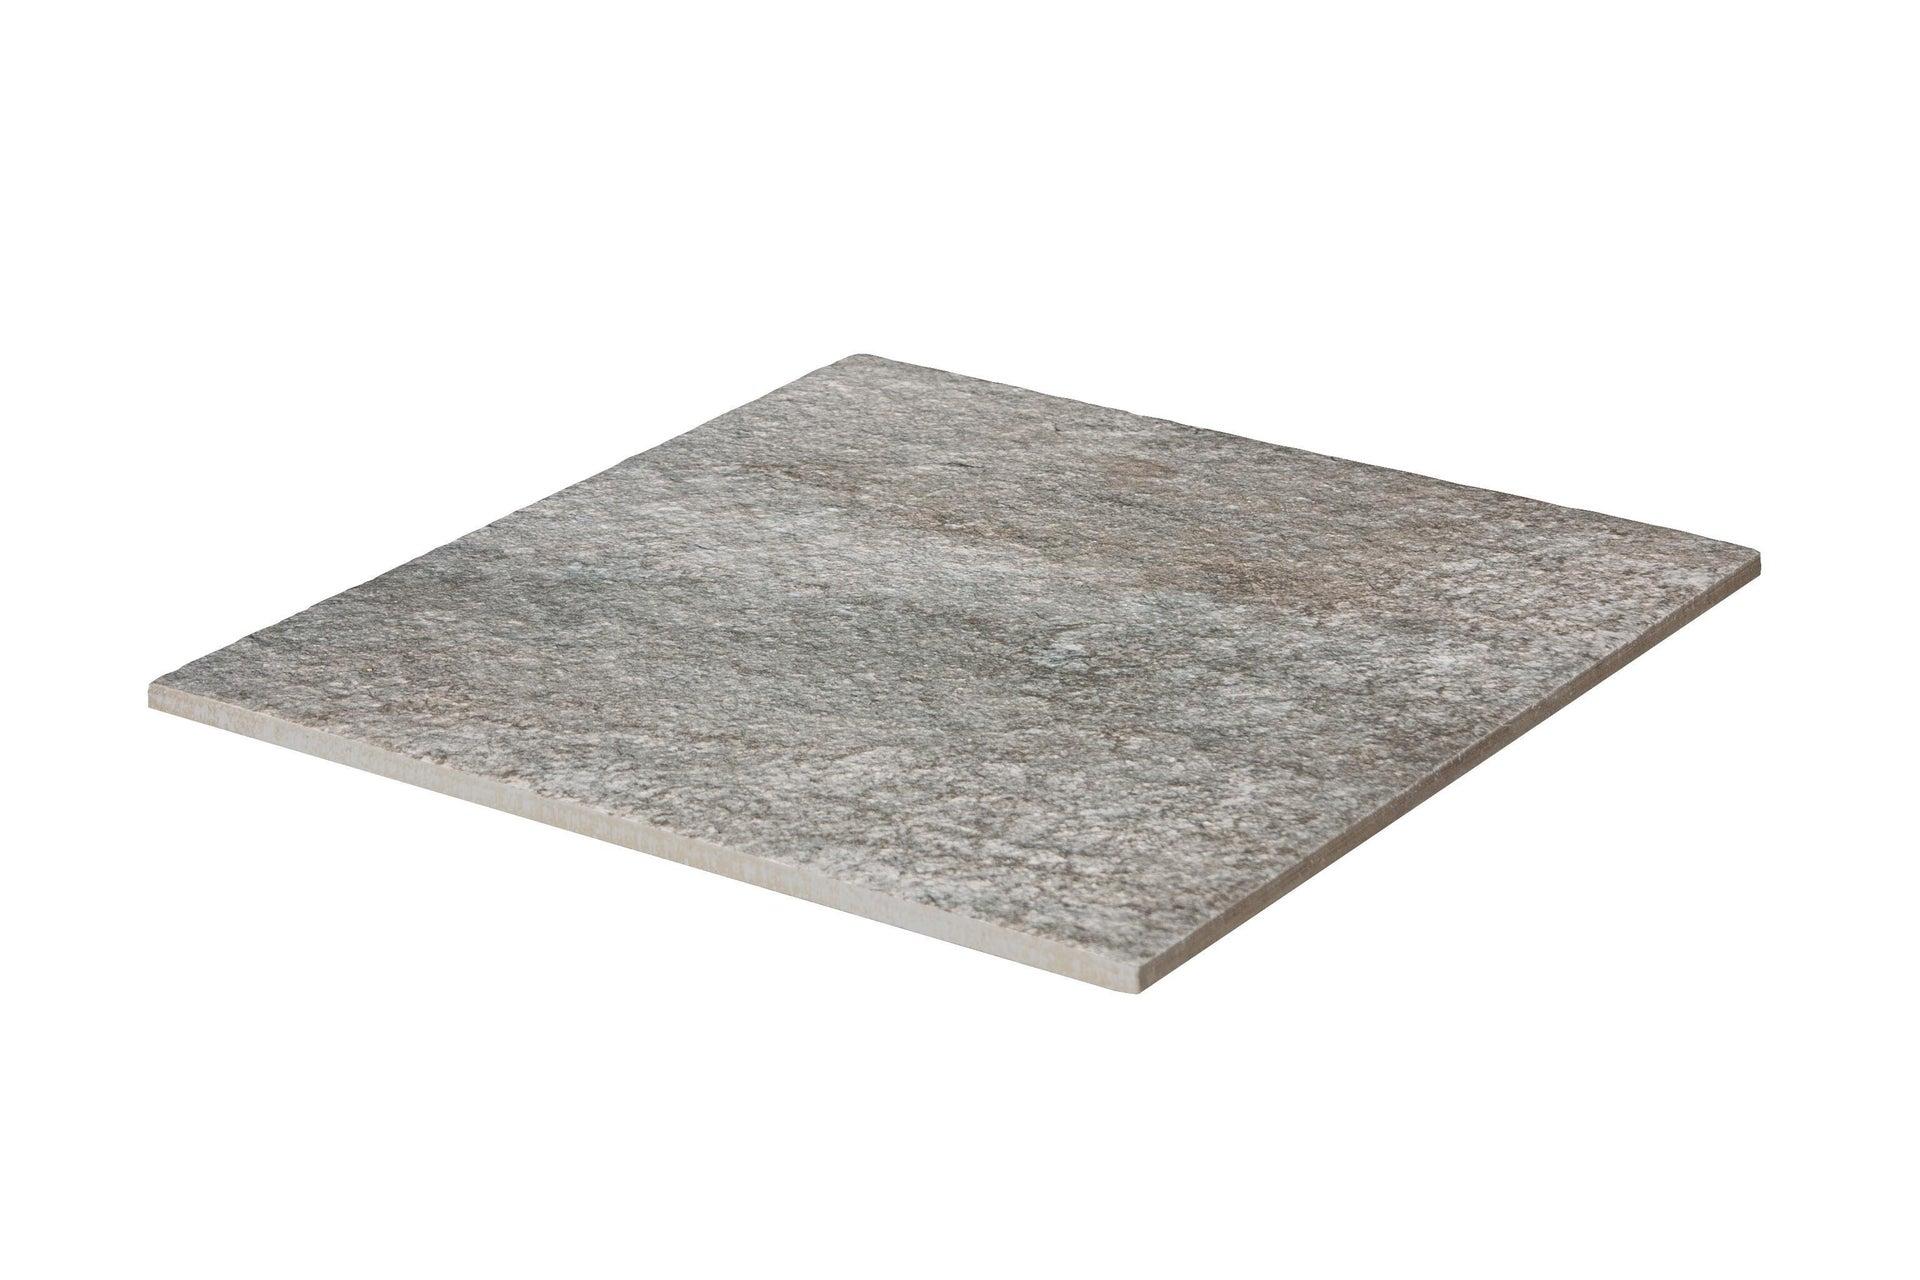 Piastrella da pavimento Walk 32.5 x 32.5 cm sp. 9 mm PEI 3/5 grigio - 2